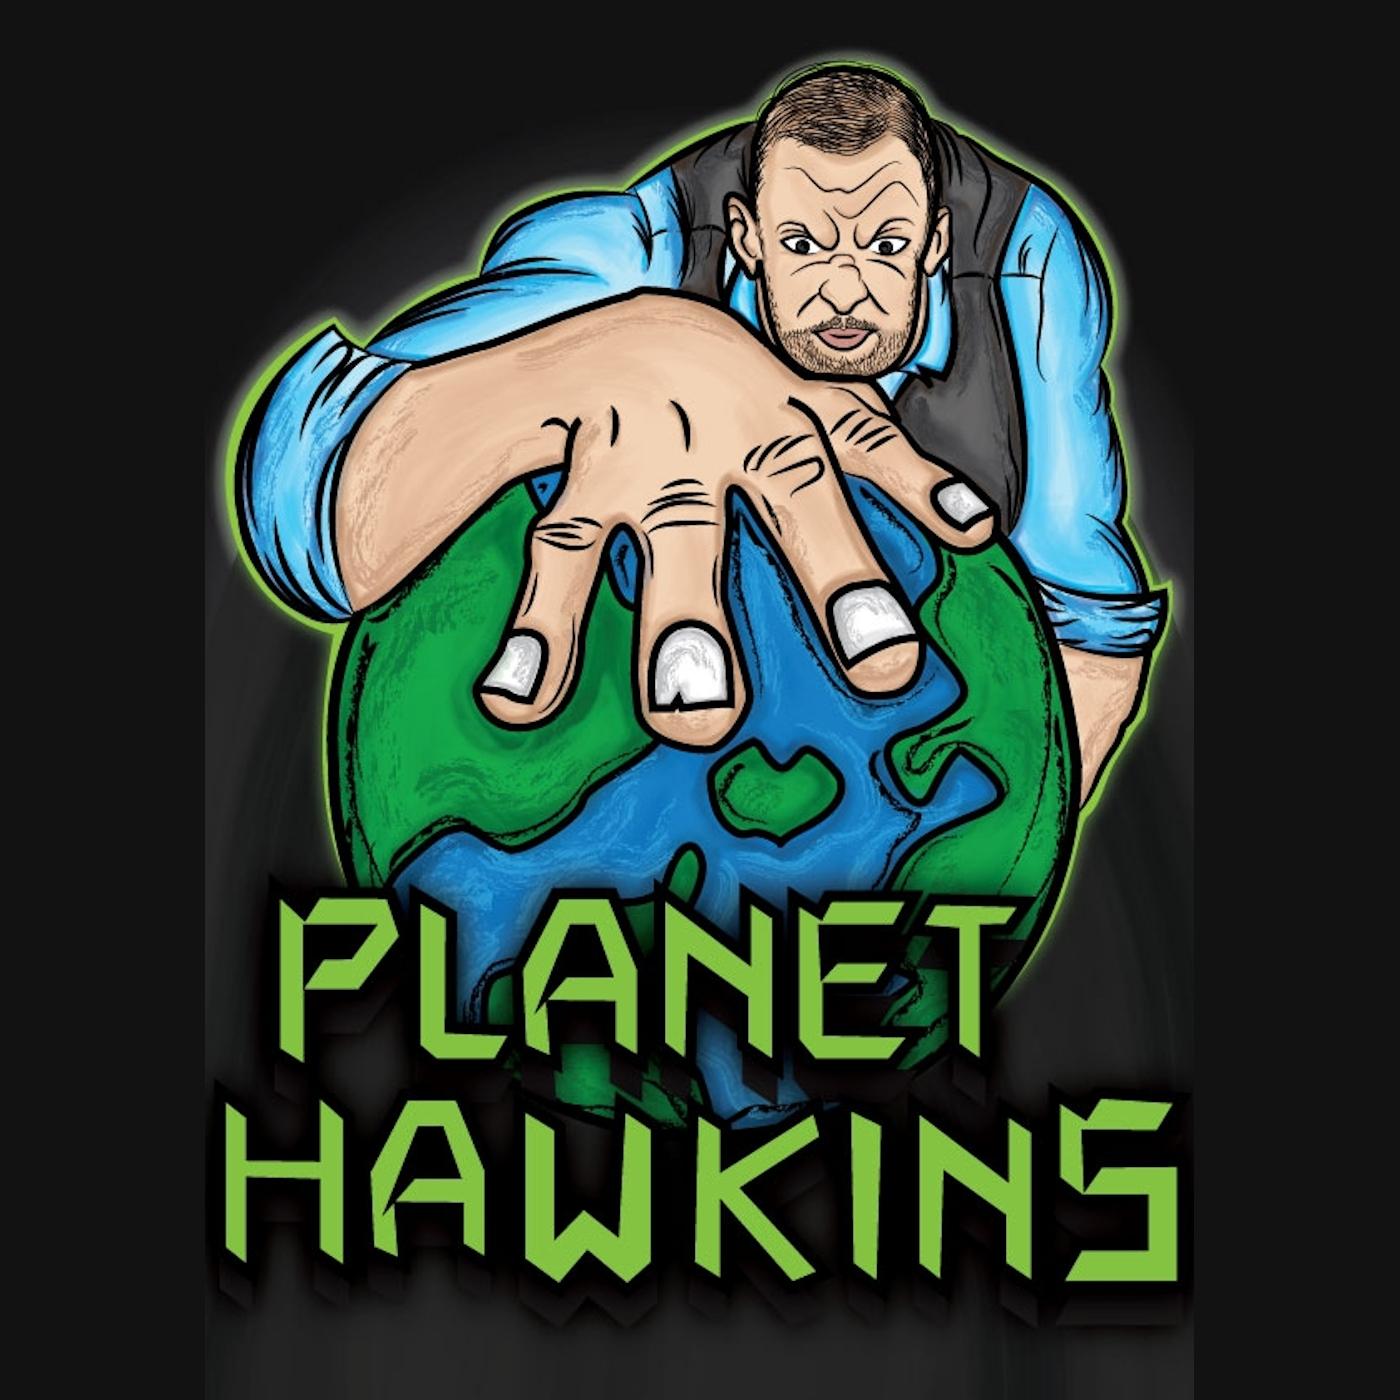 Planet Hawkins show art